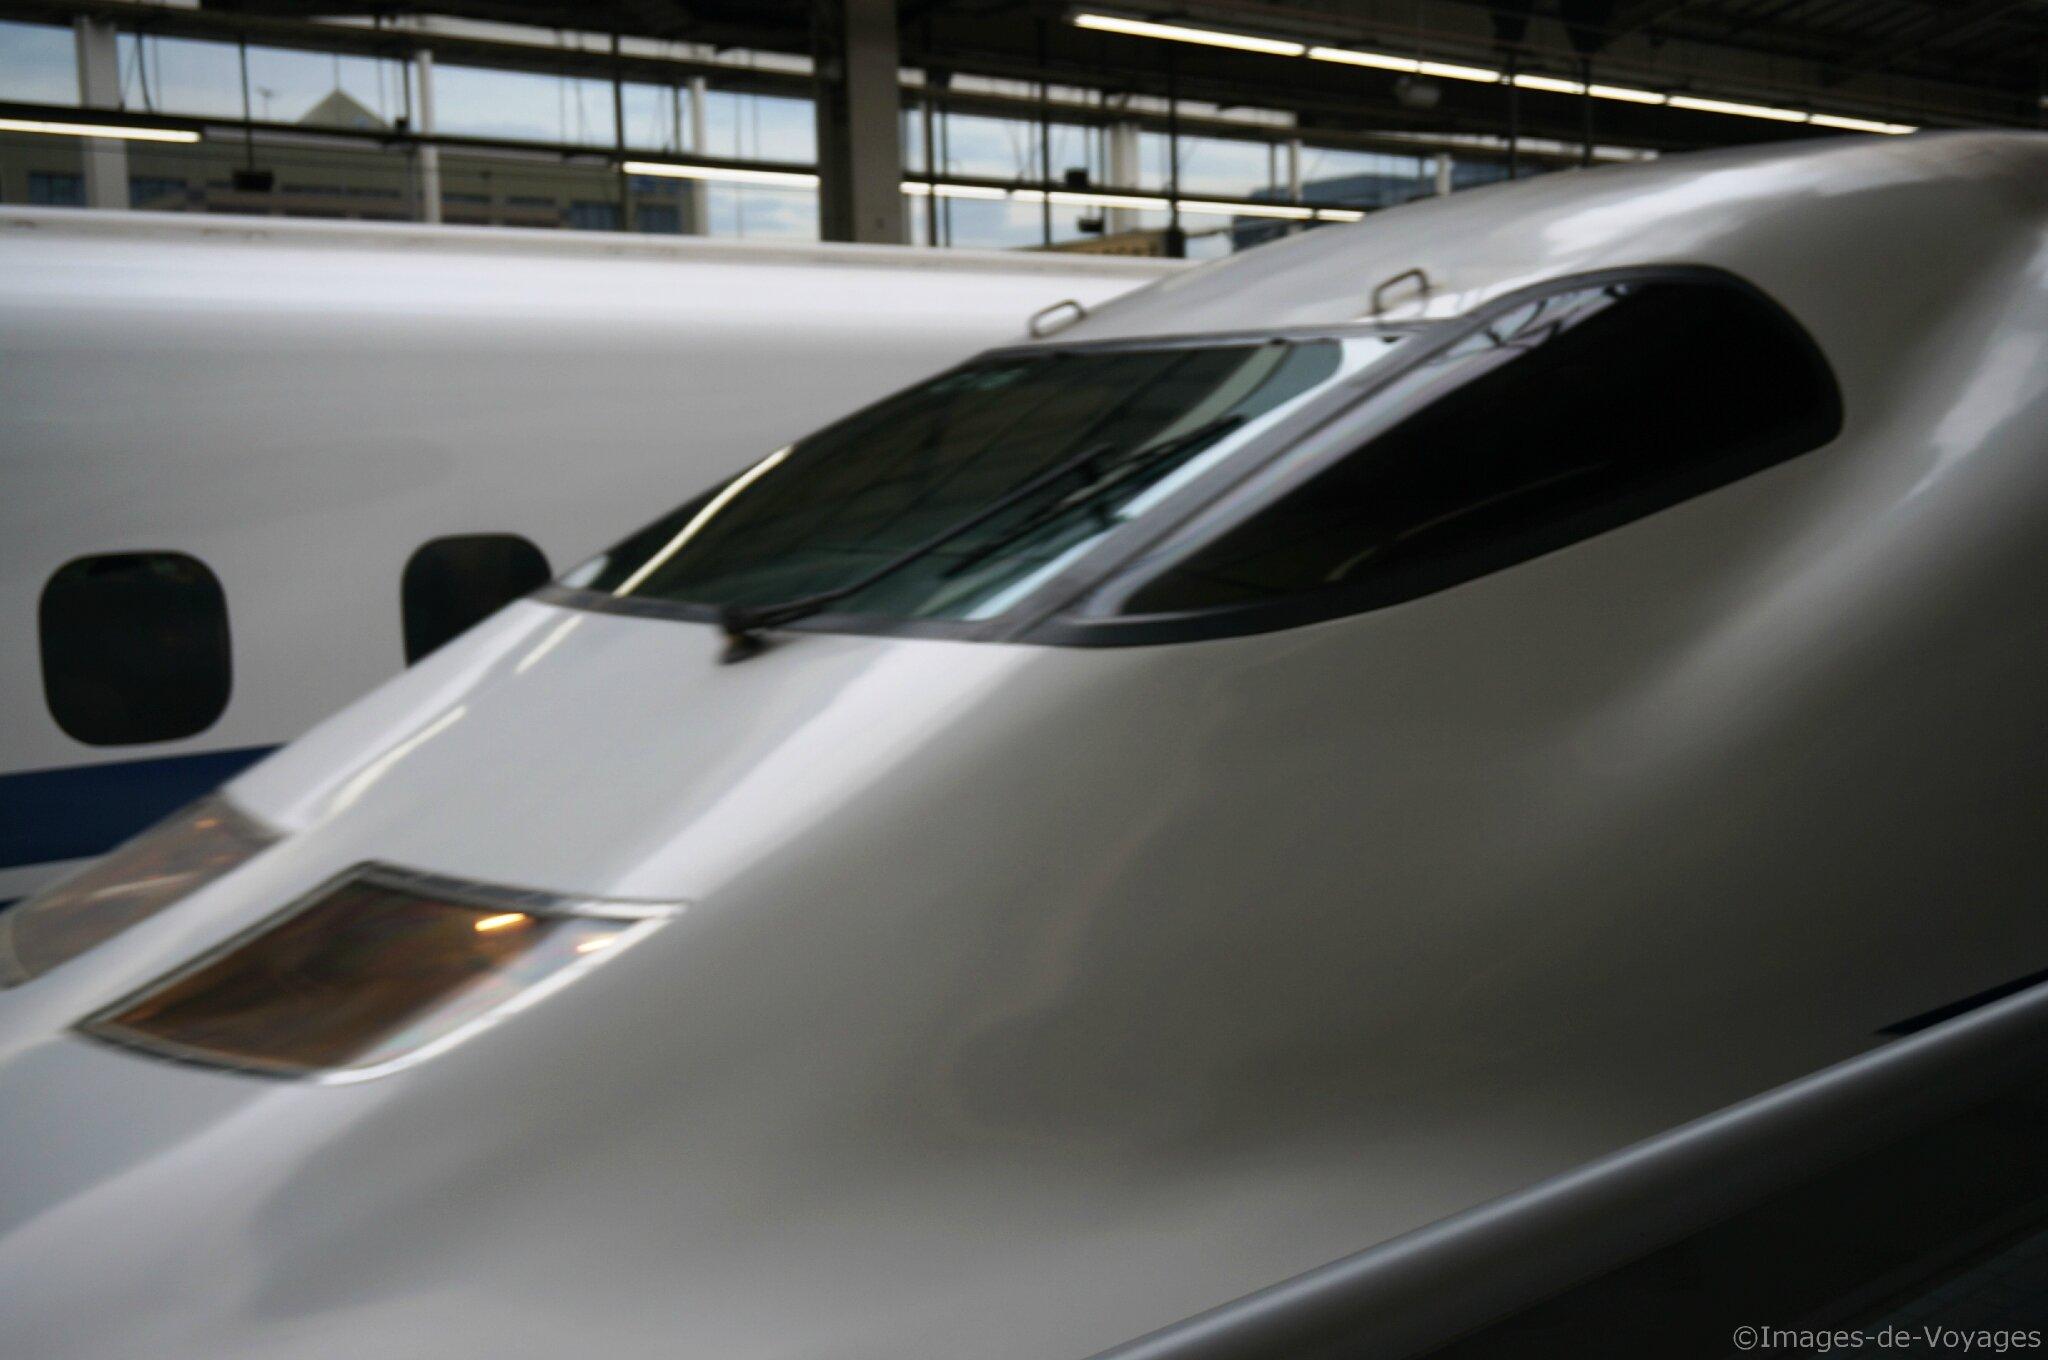 Kyoto - Bullet train